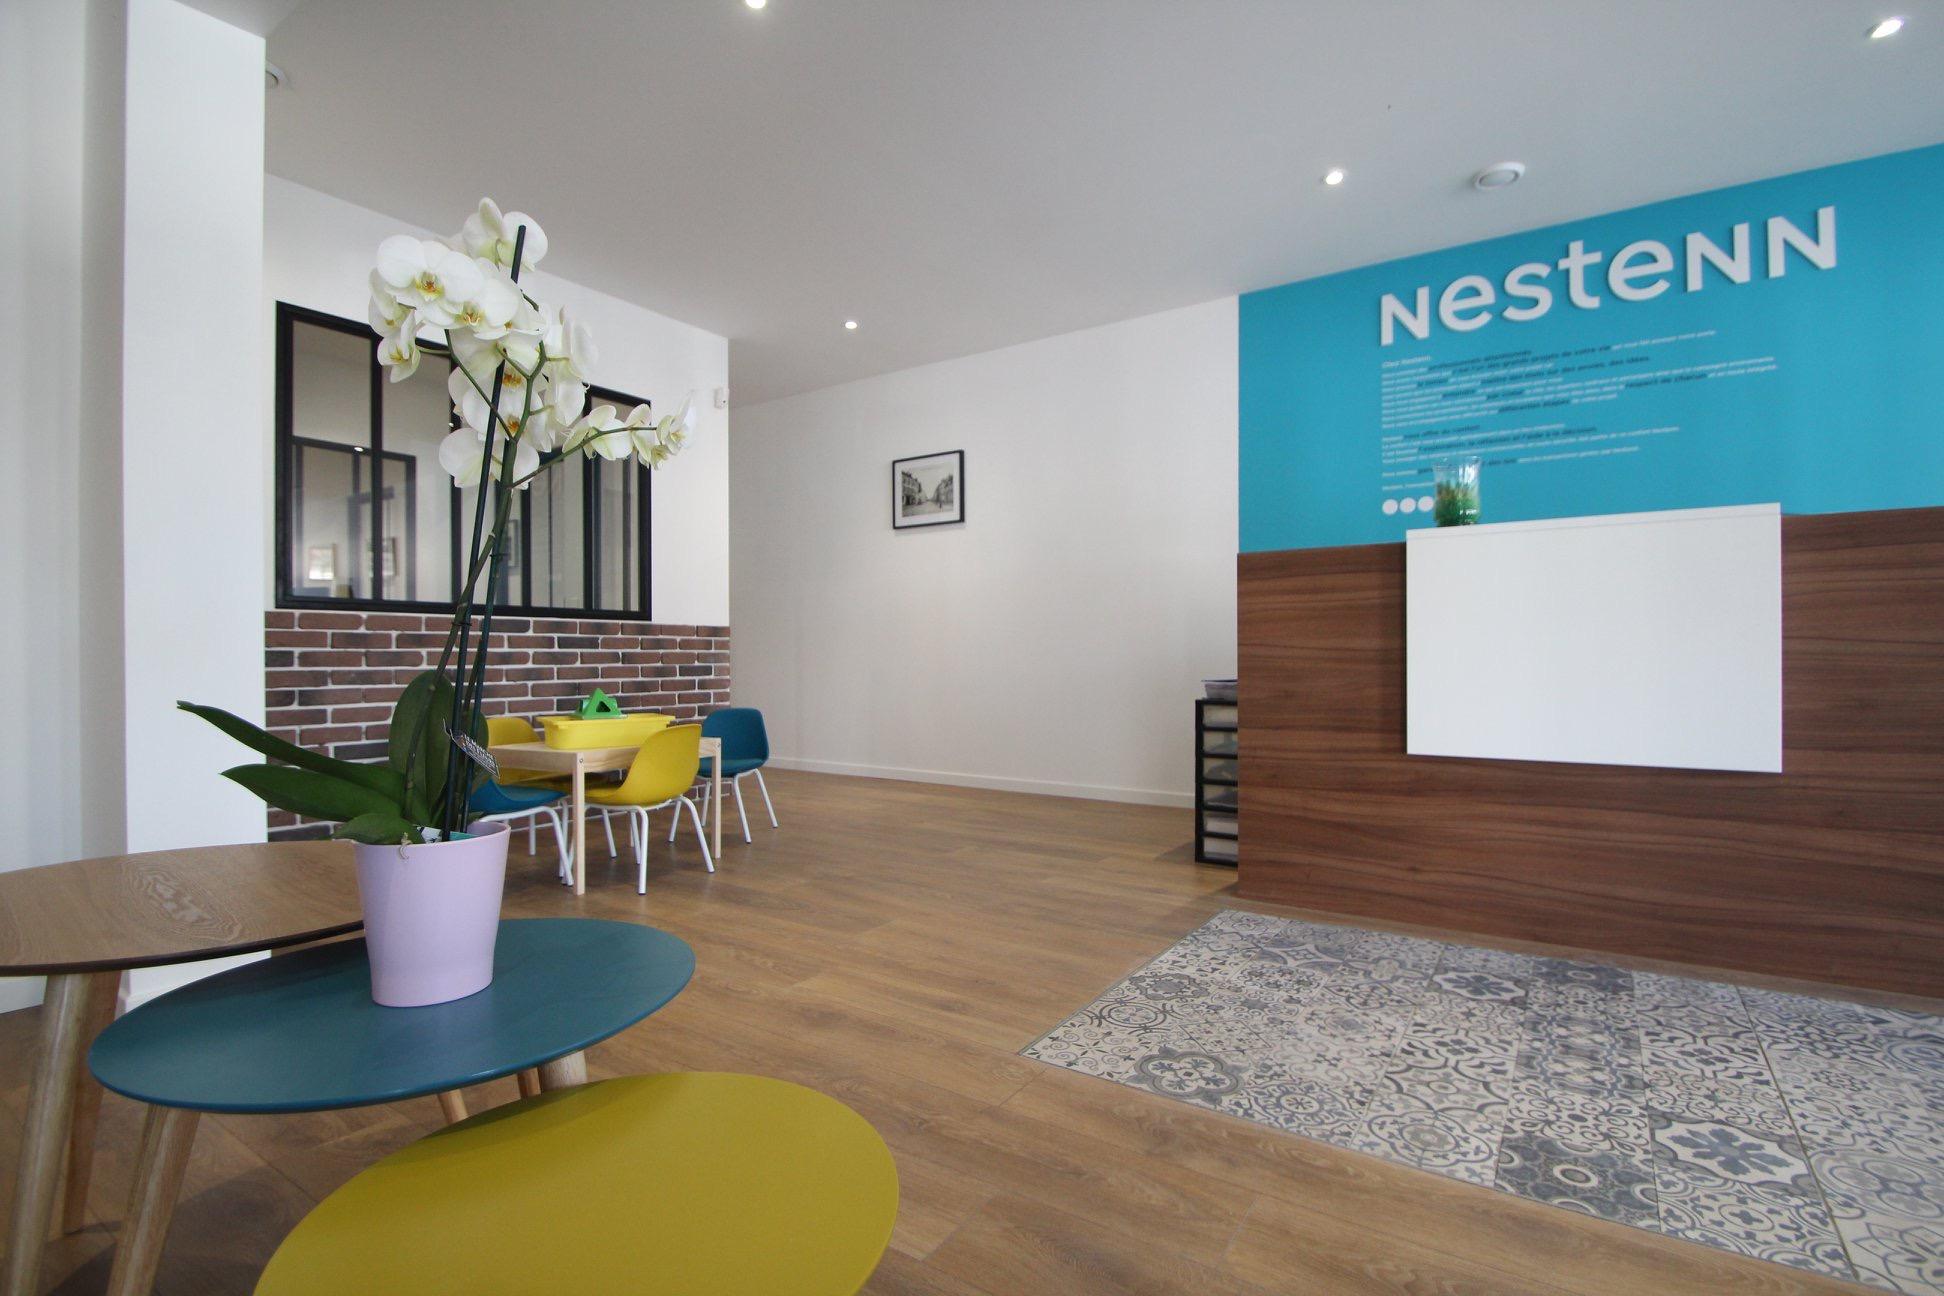 Rénovation et Inauguration agence immobilière Nestenn Magny-en-Vexin